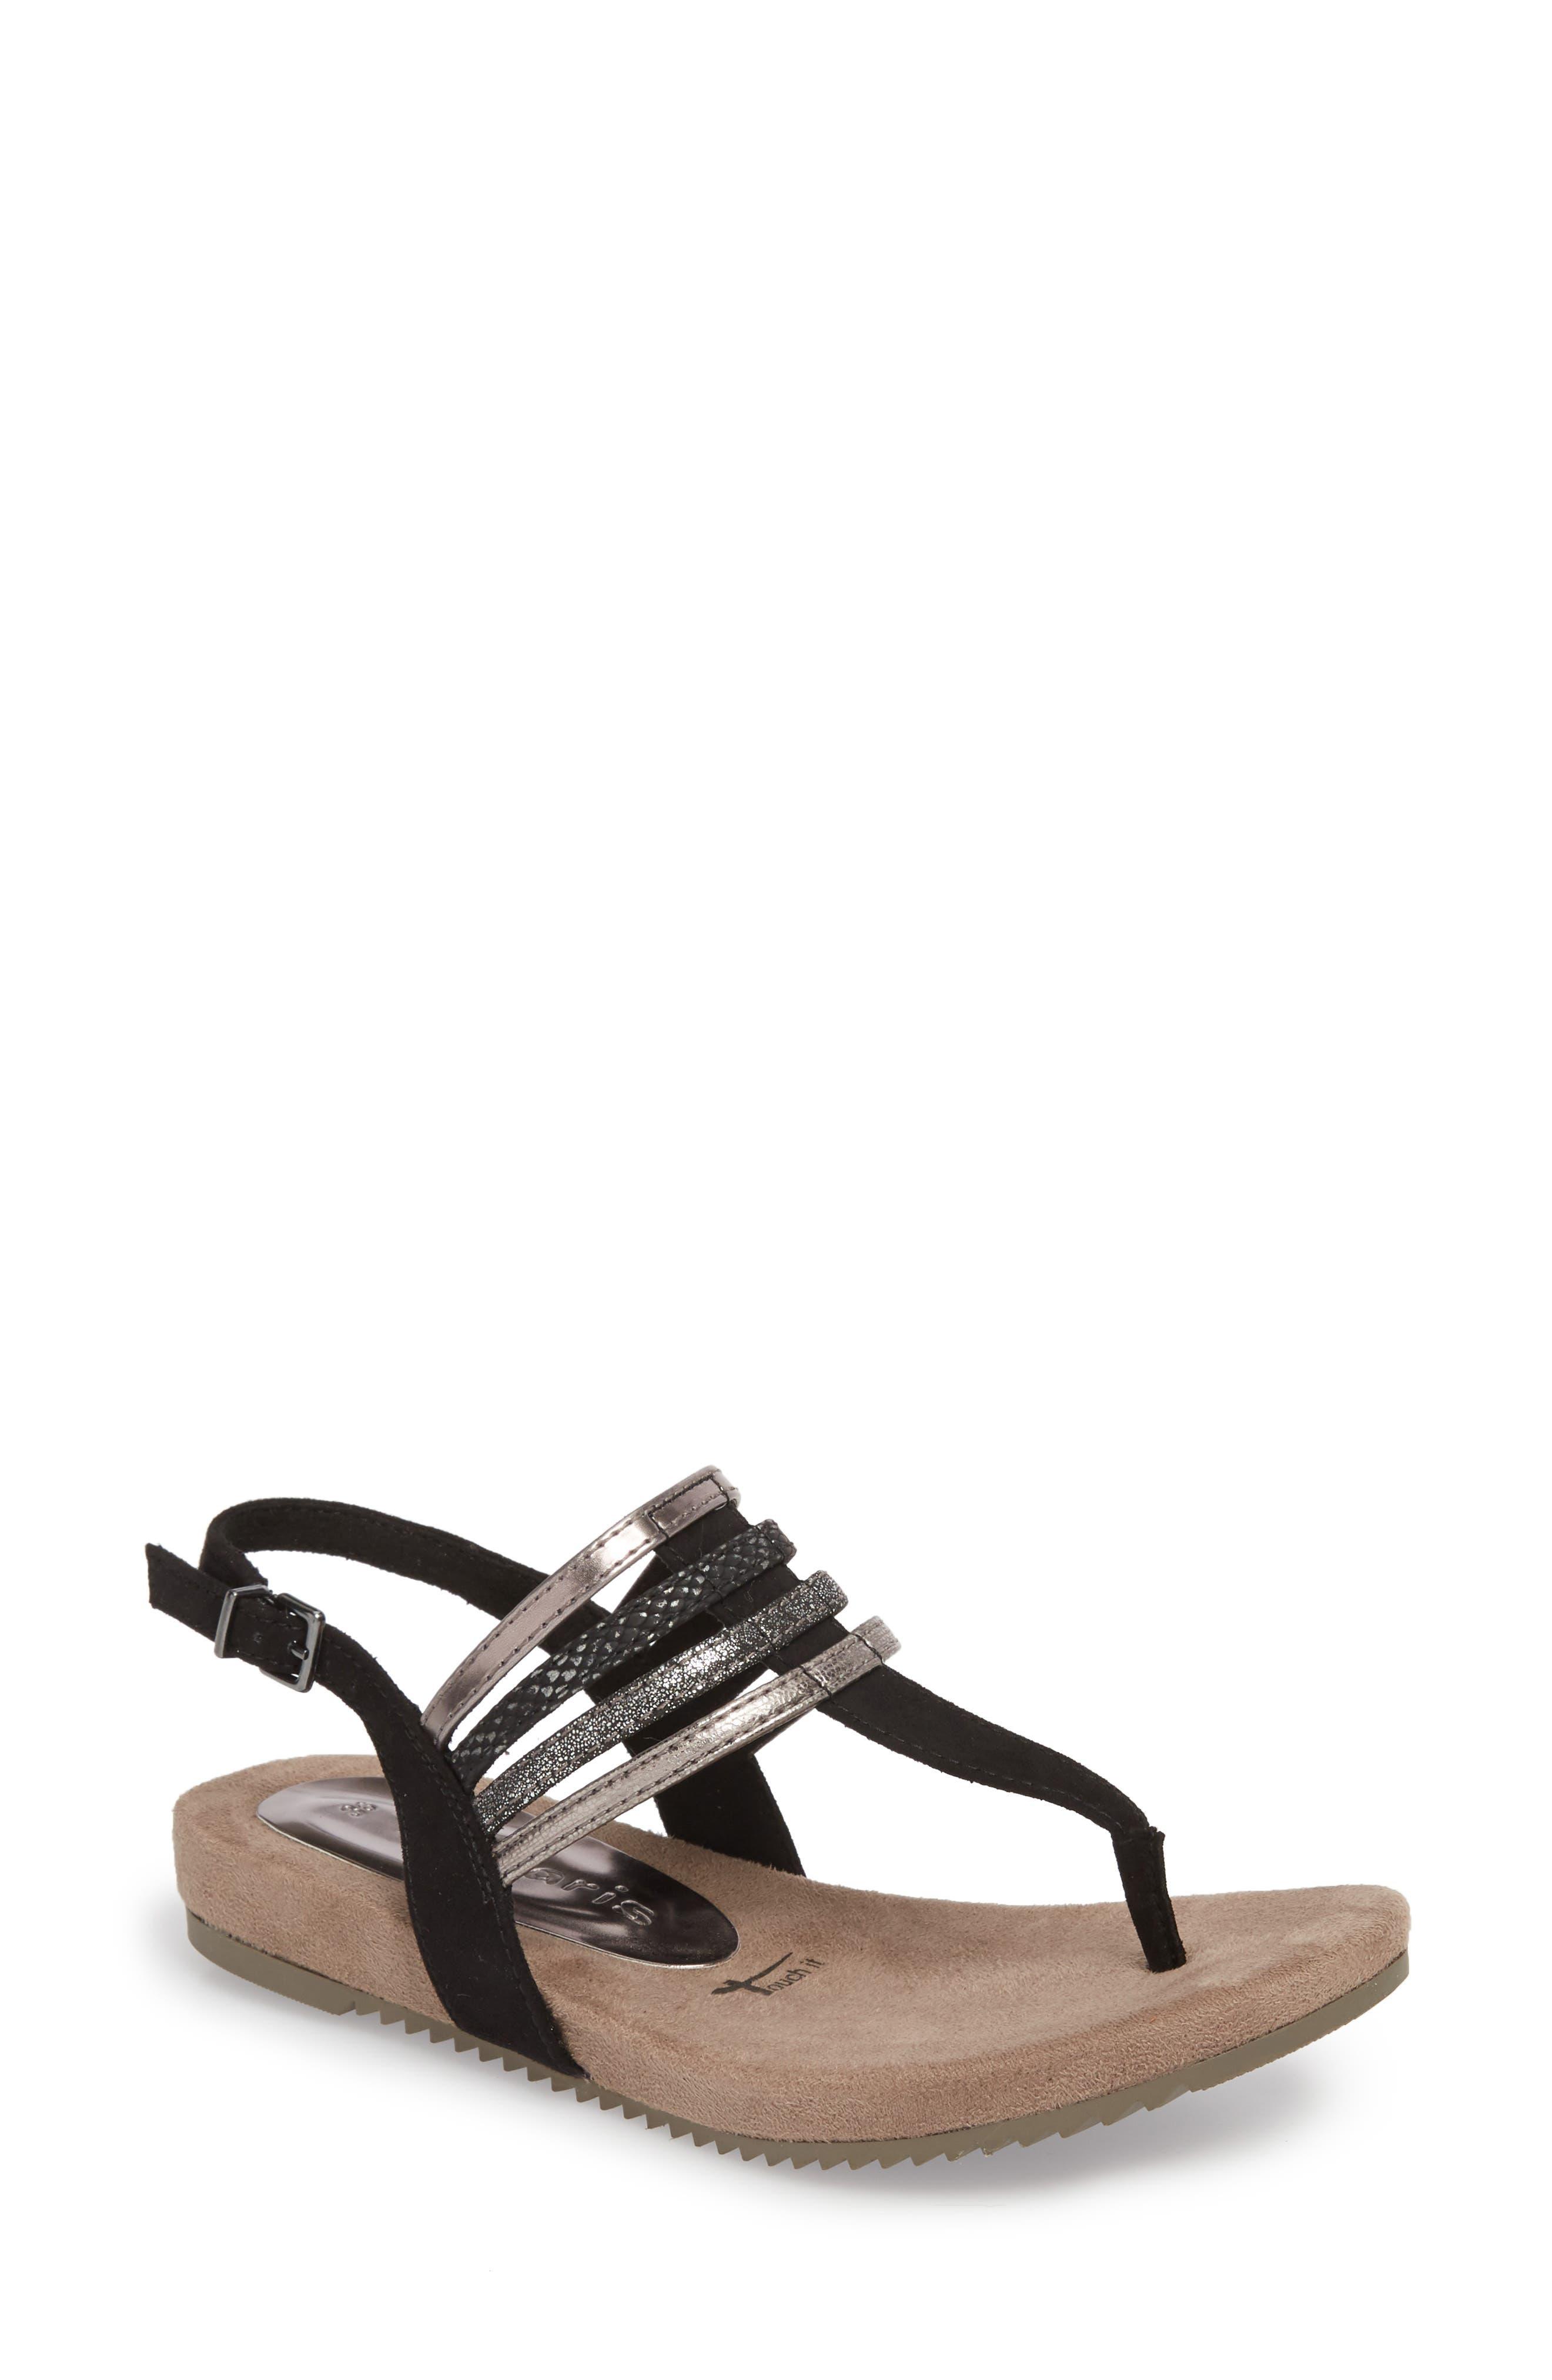 Locust Sandal,                             Main thumbnail 1, color,                             Black Fabric